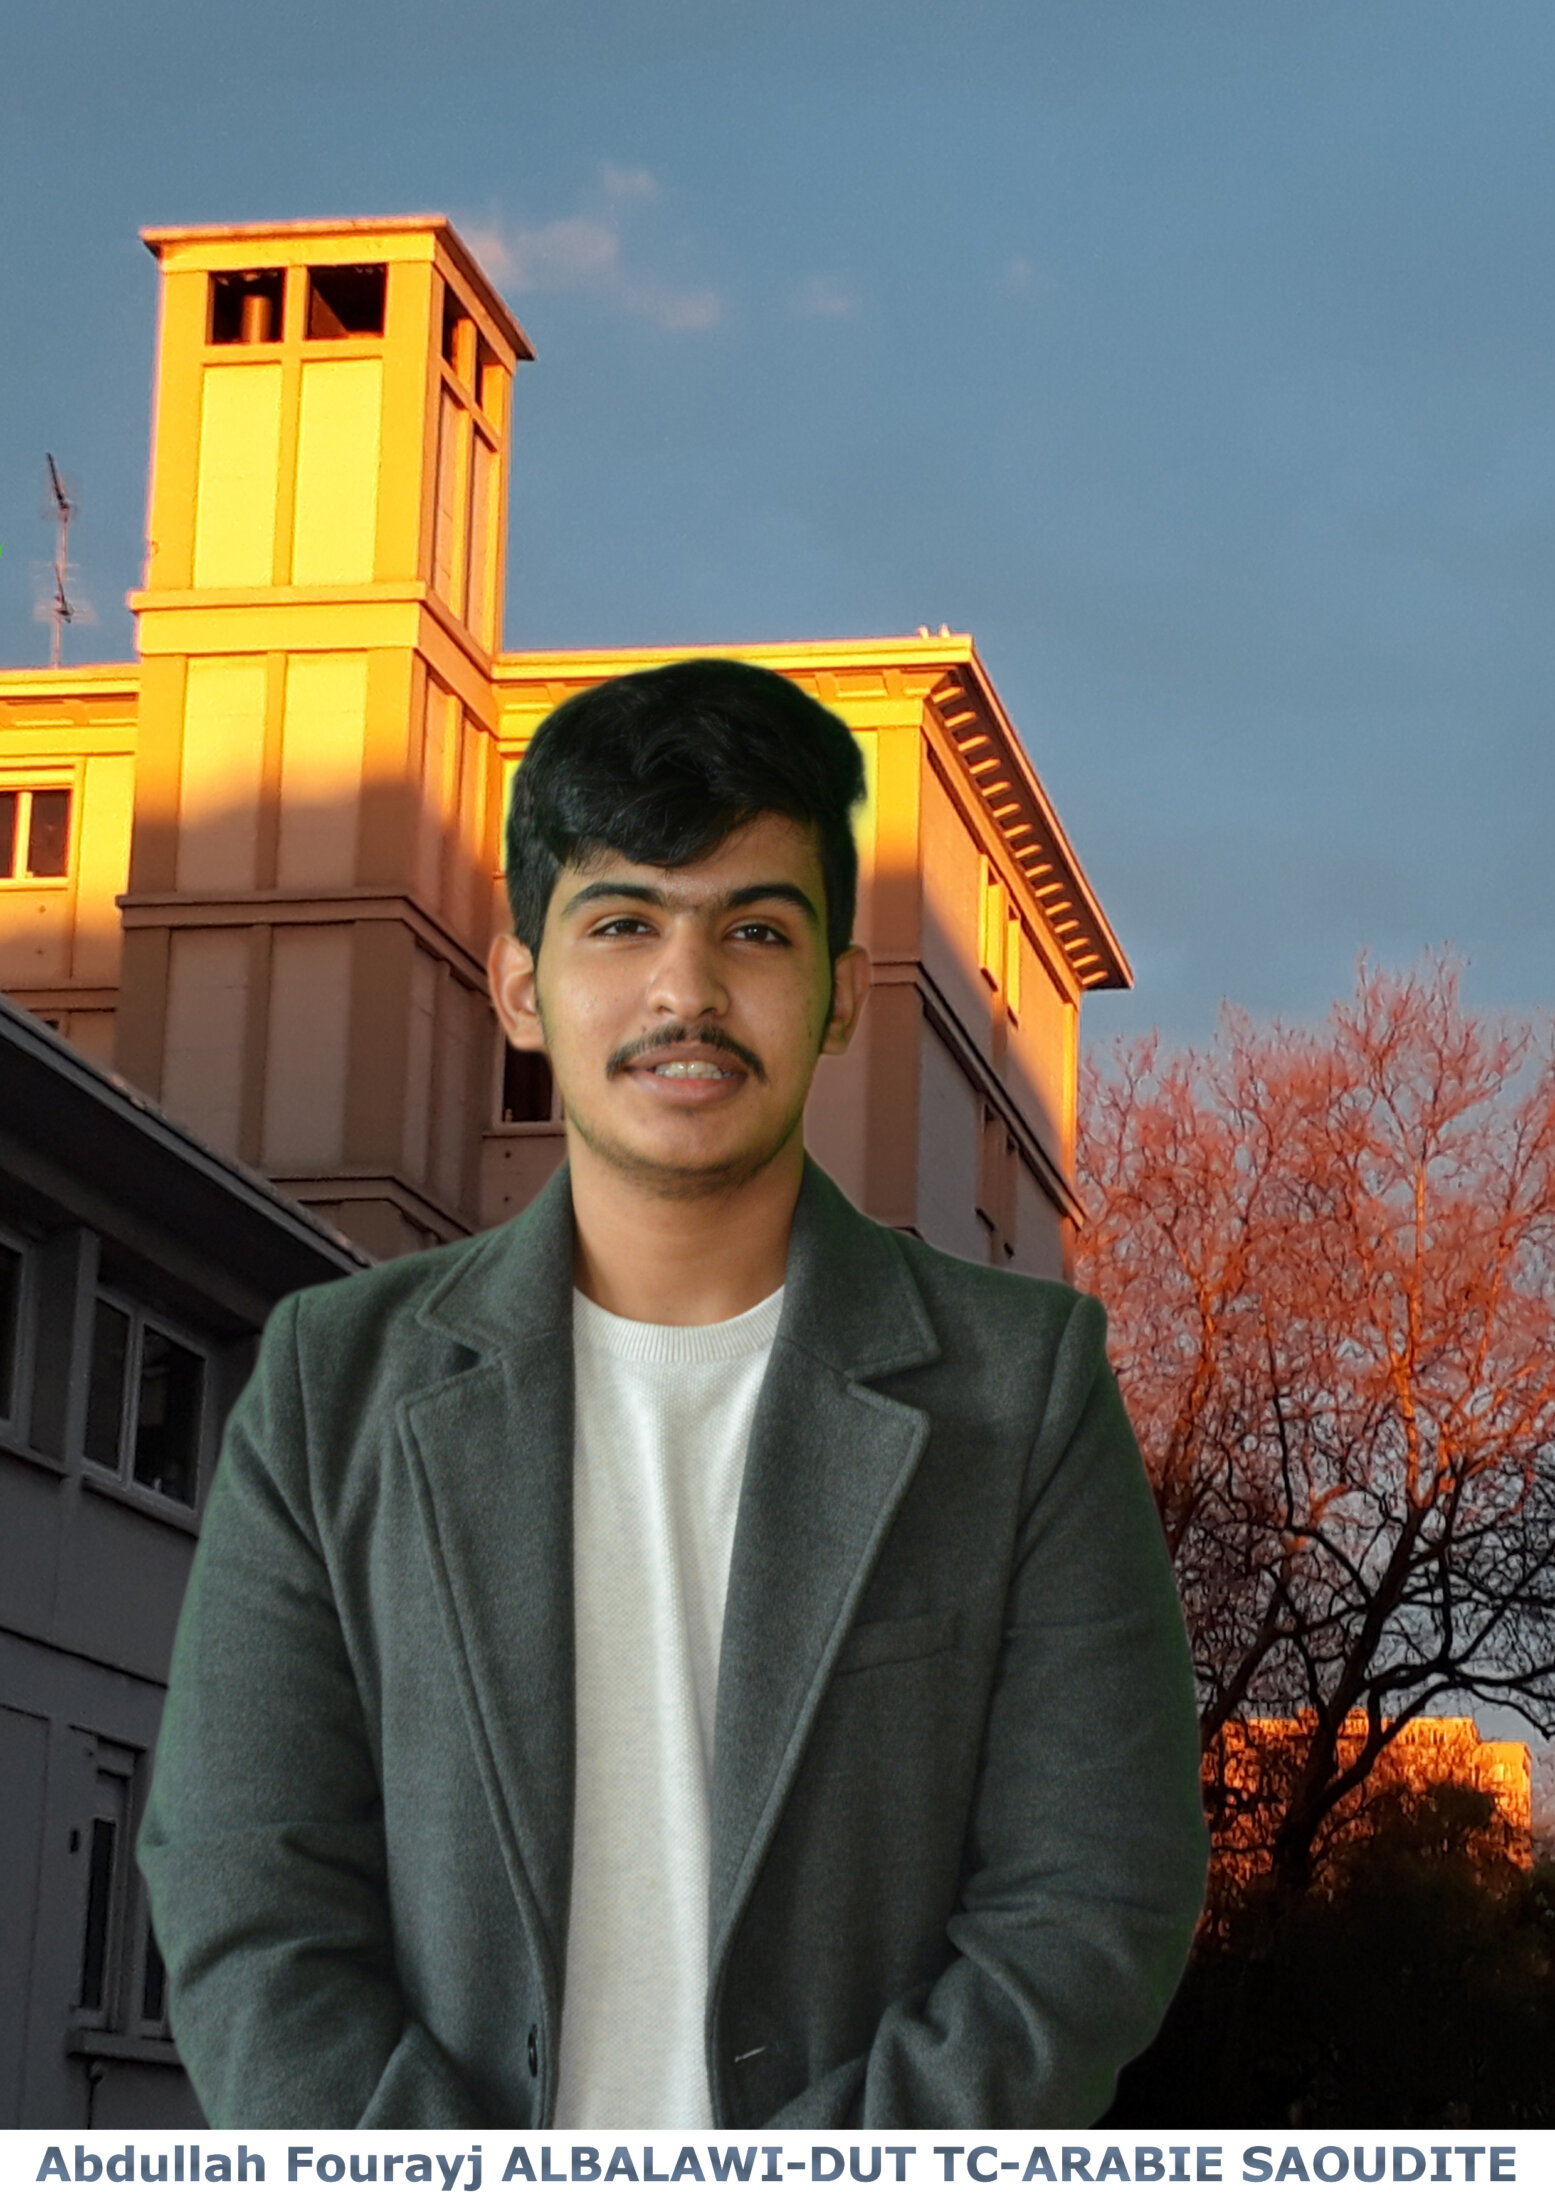 Abdullah Fourayj ALBALAWI Perrey